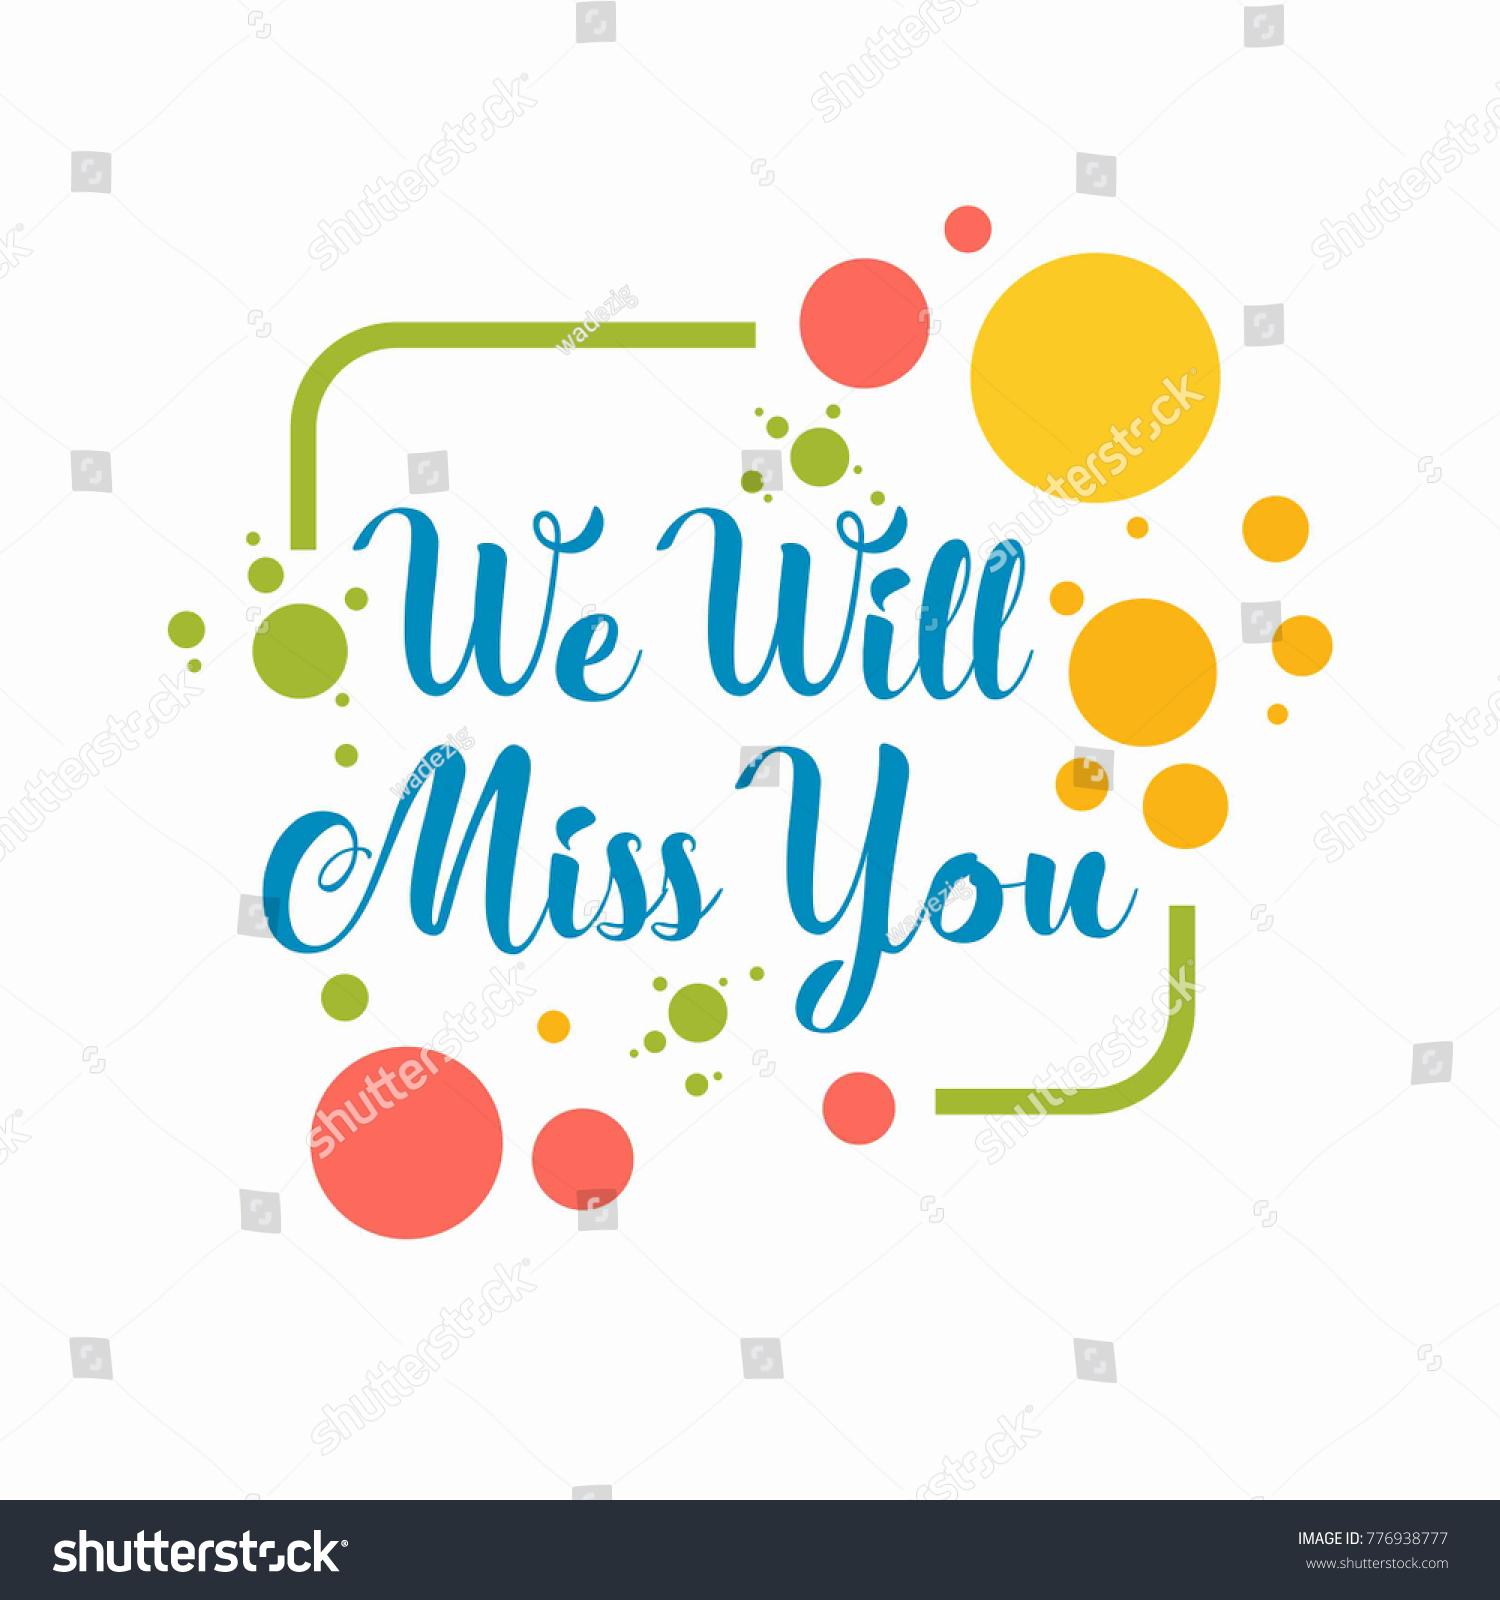 farewell card we will miss you のベクター画像素材 ロイヤリティ